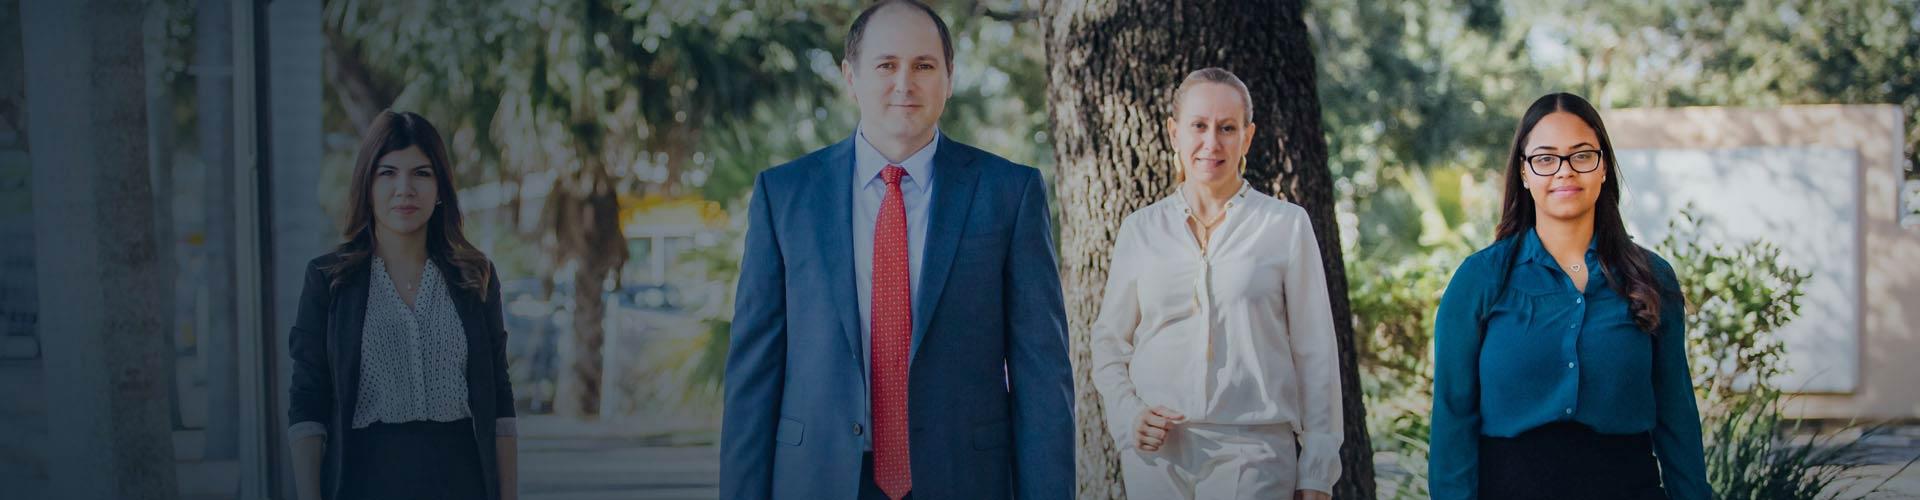 Miami Dade Loan Modification Attorneys - Stiberman Law Firm